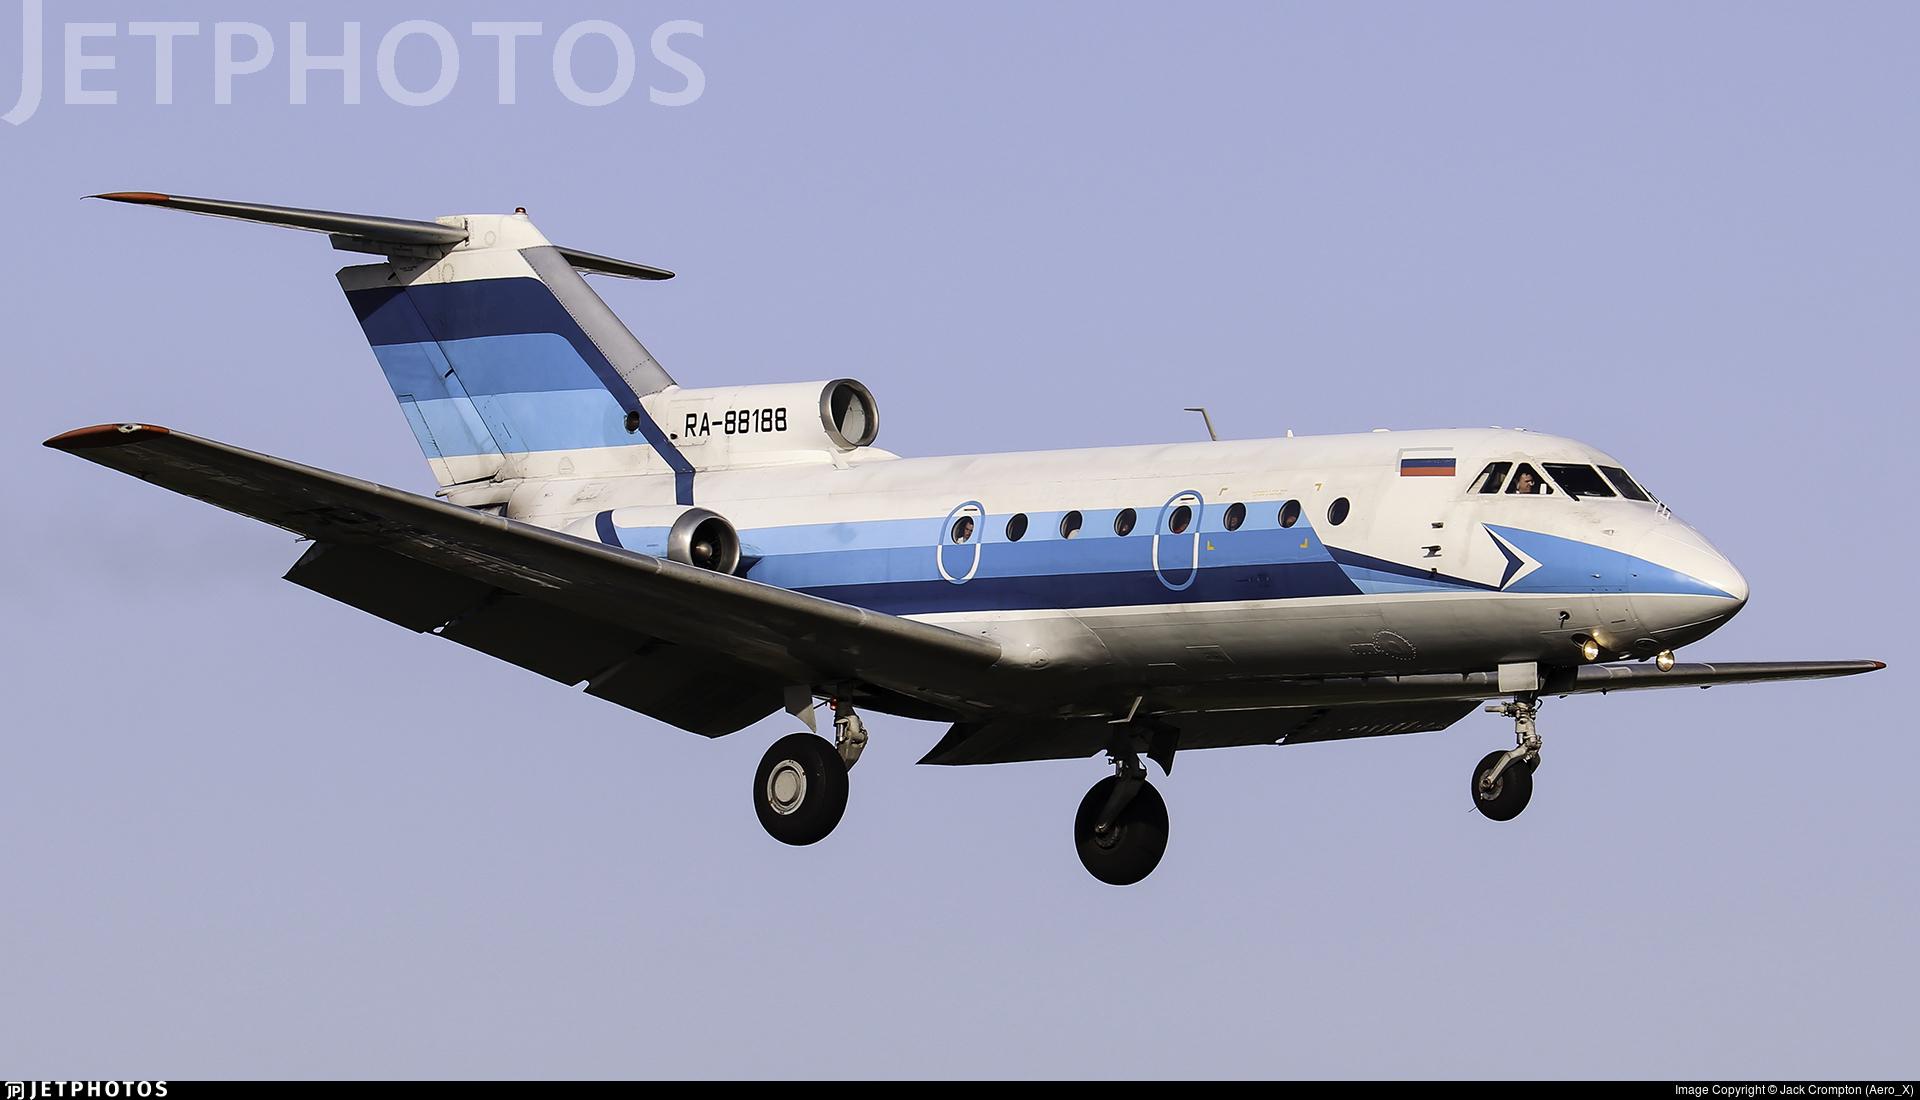 RA-88188 - Yakovlev Yak-40 - Vologda Air